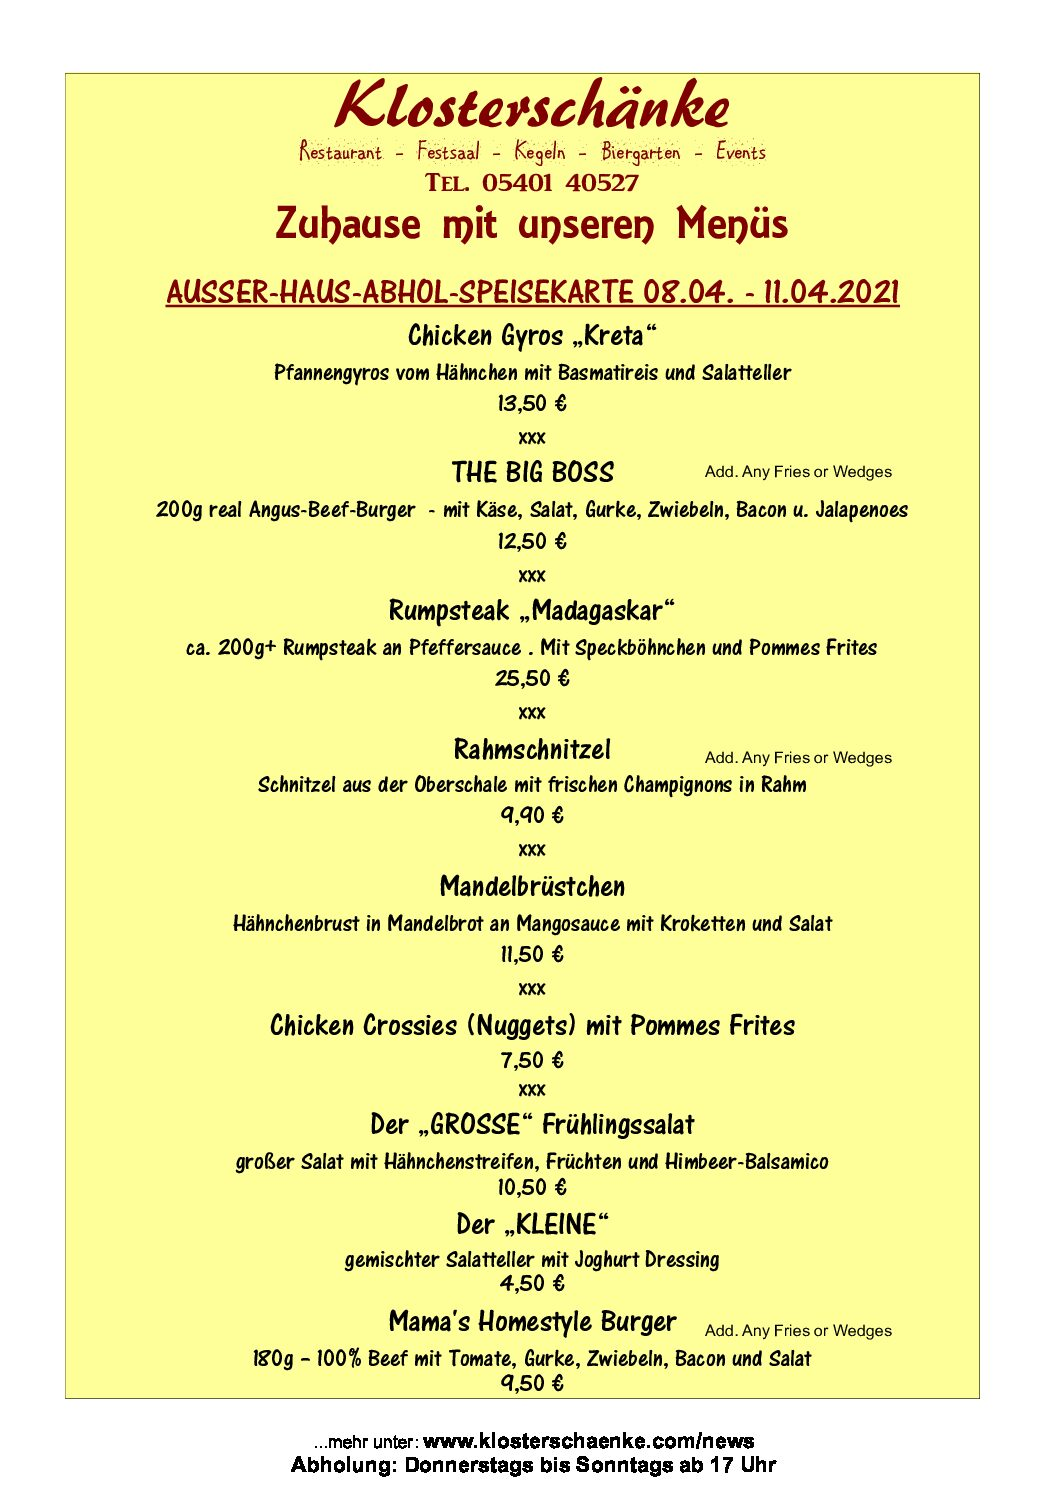 AUSSER-HAUS-SPEISEKARTE 08.04. – 11.04.2021